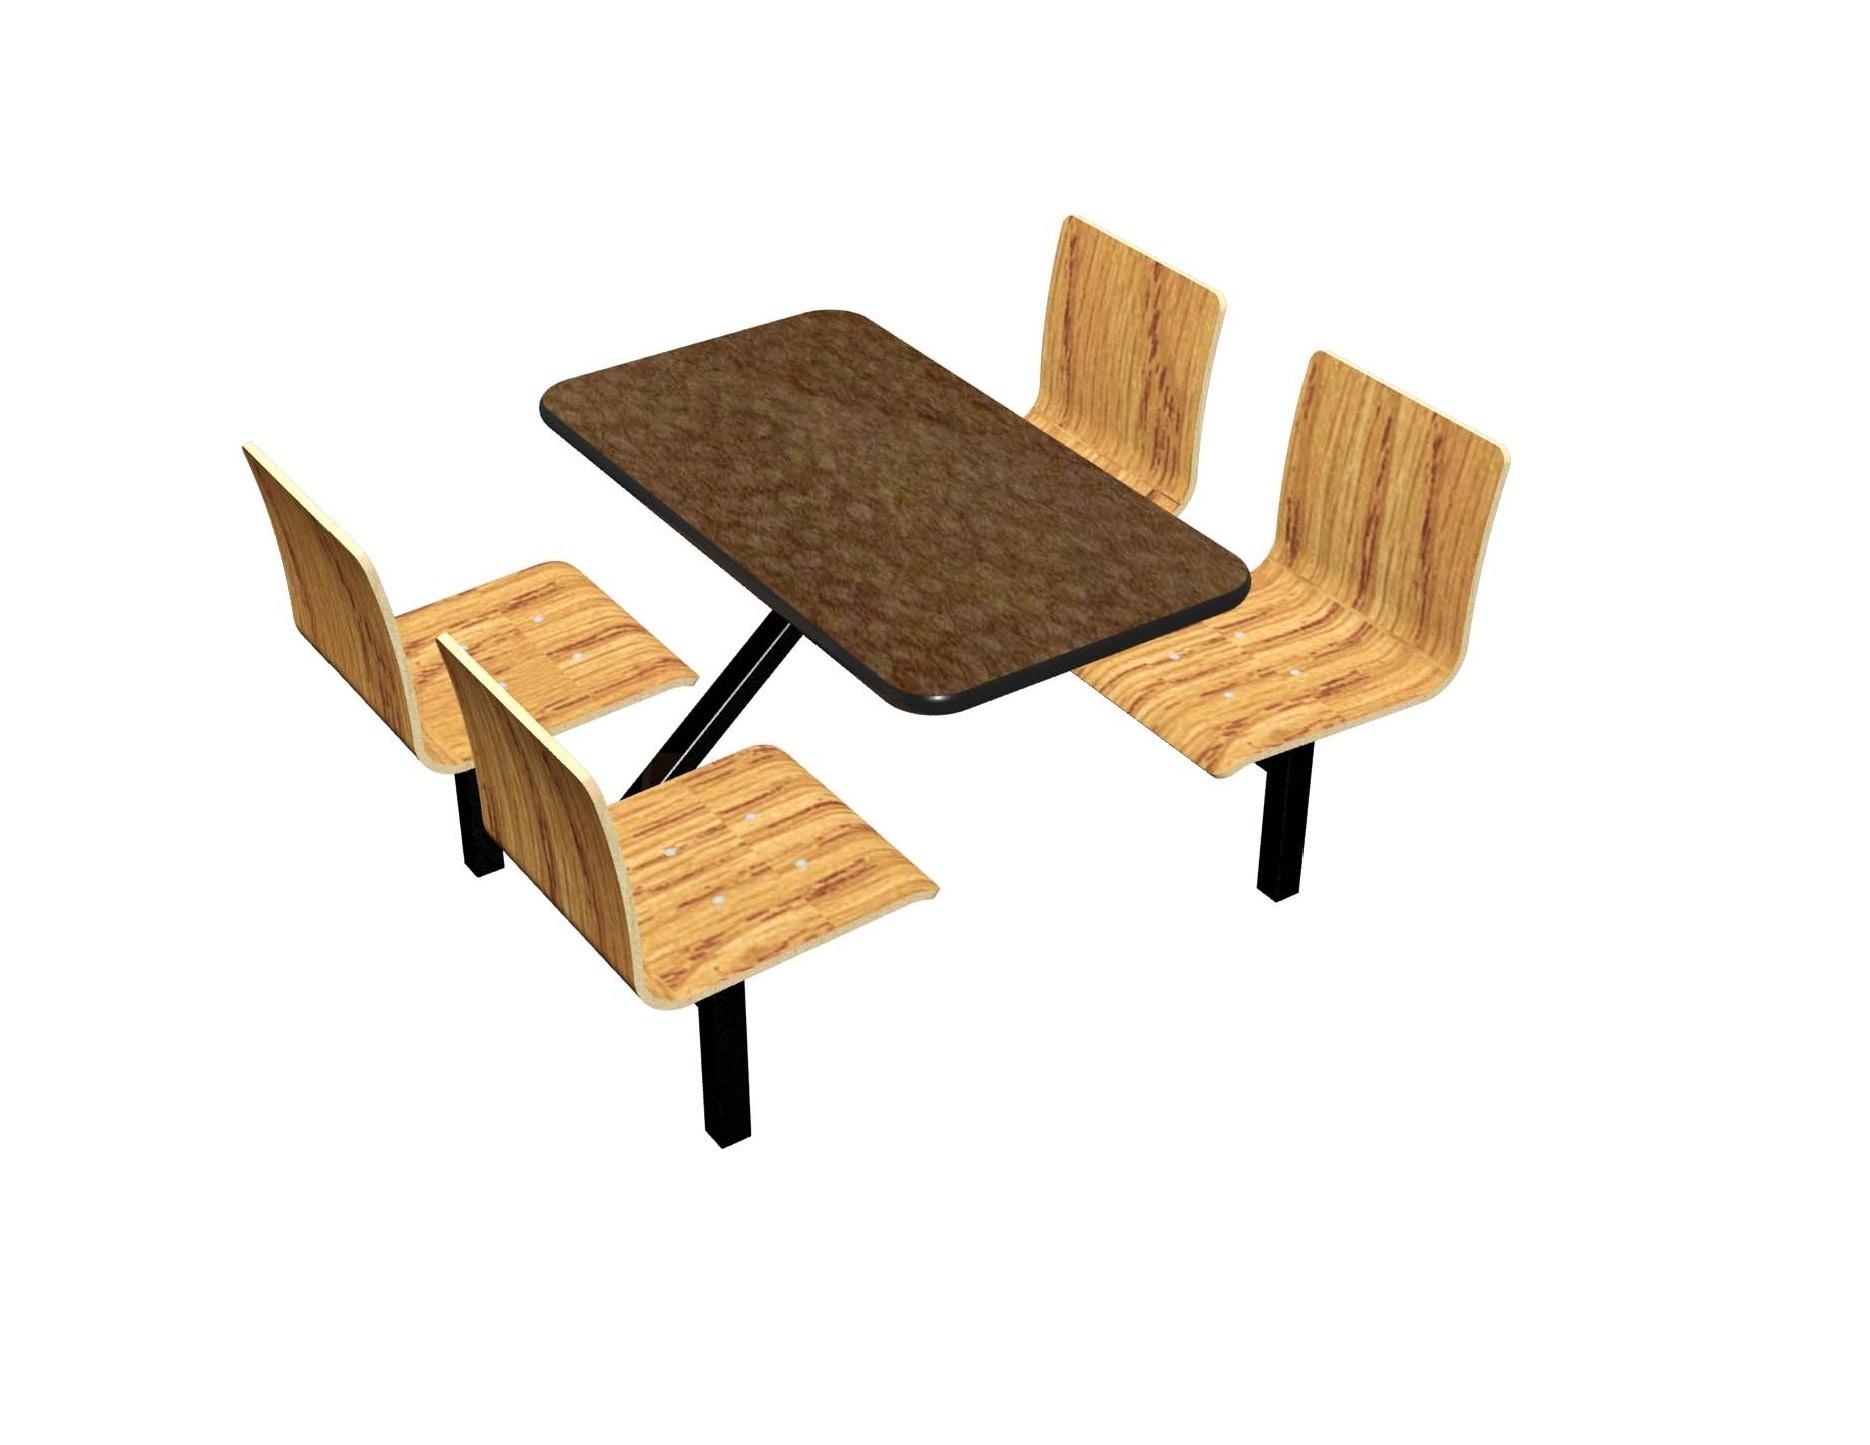 Morro Zephyr laminate table, Black vinyl edge, Natural Oak laminae chairhead